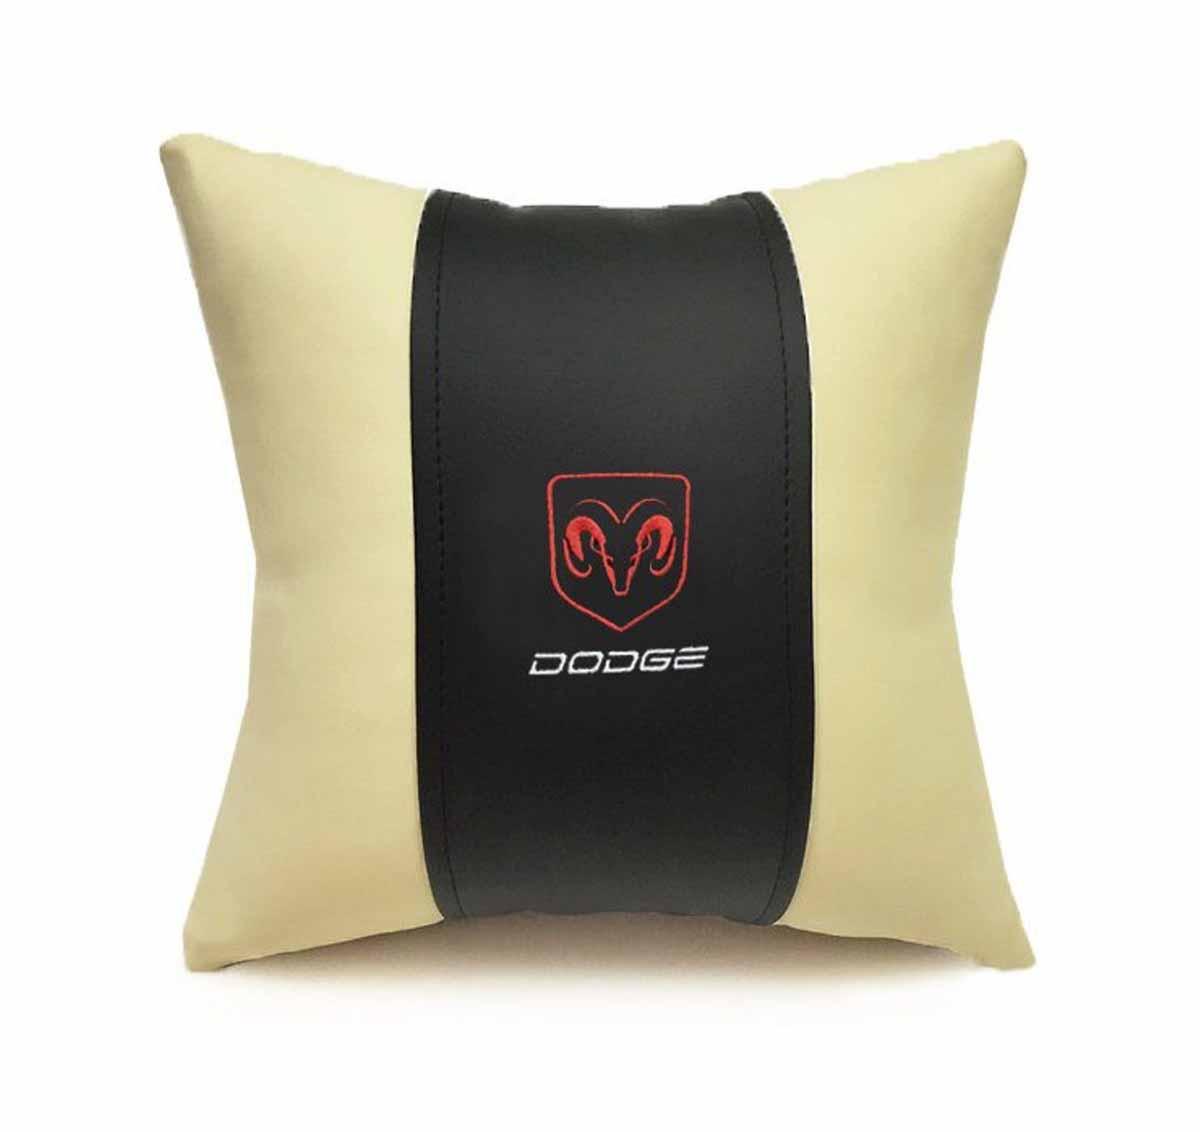 Подушка декоративная Auto premium DODGE, цвет: черно-бежевый. 37075